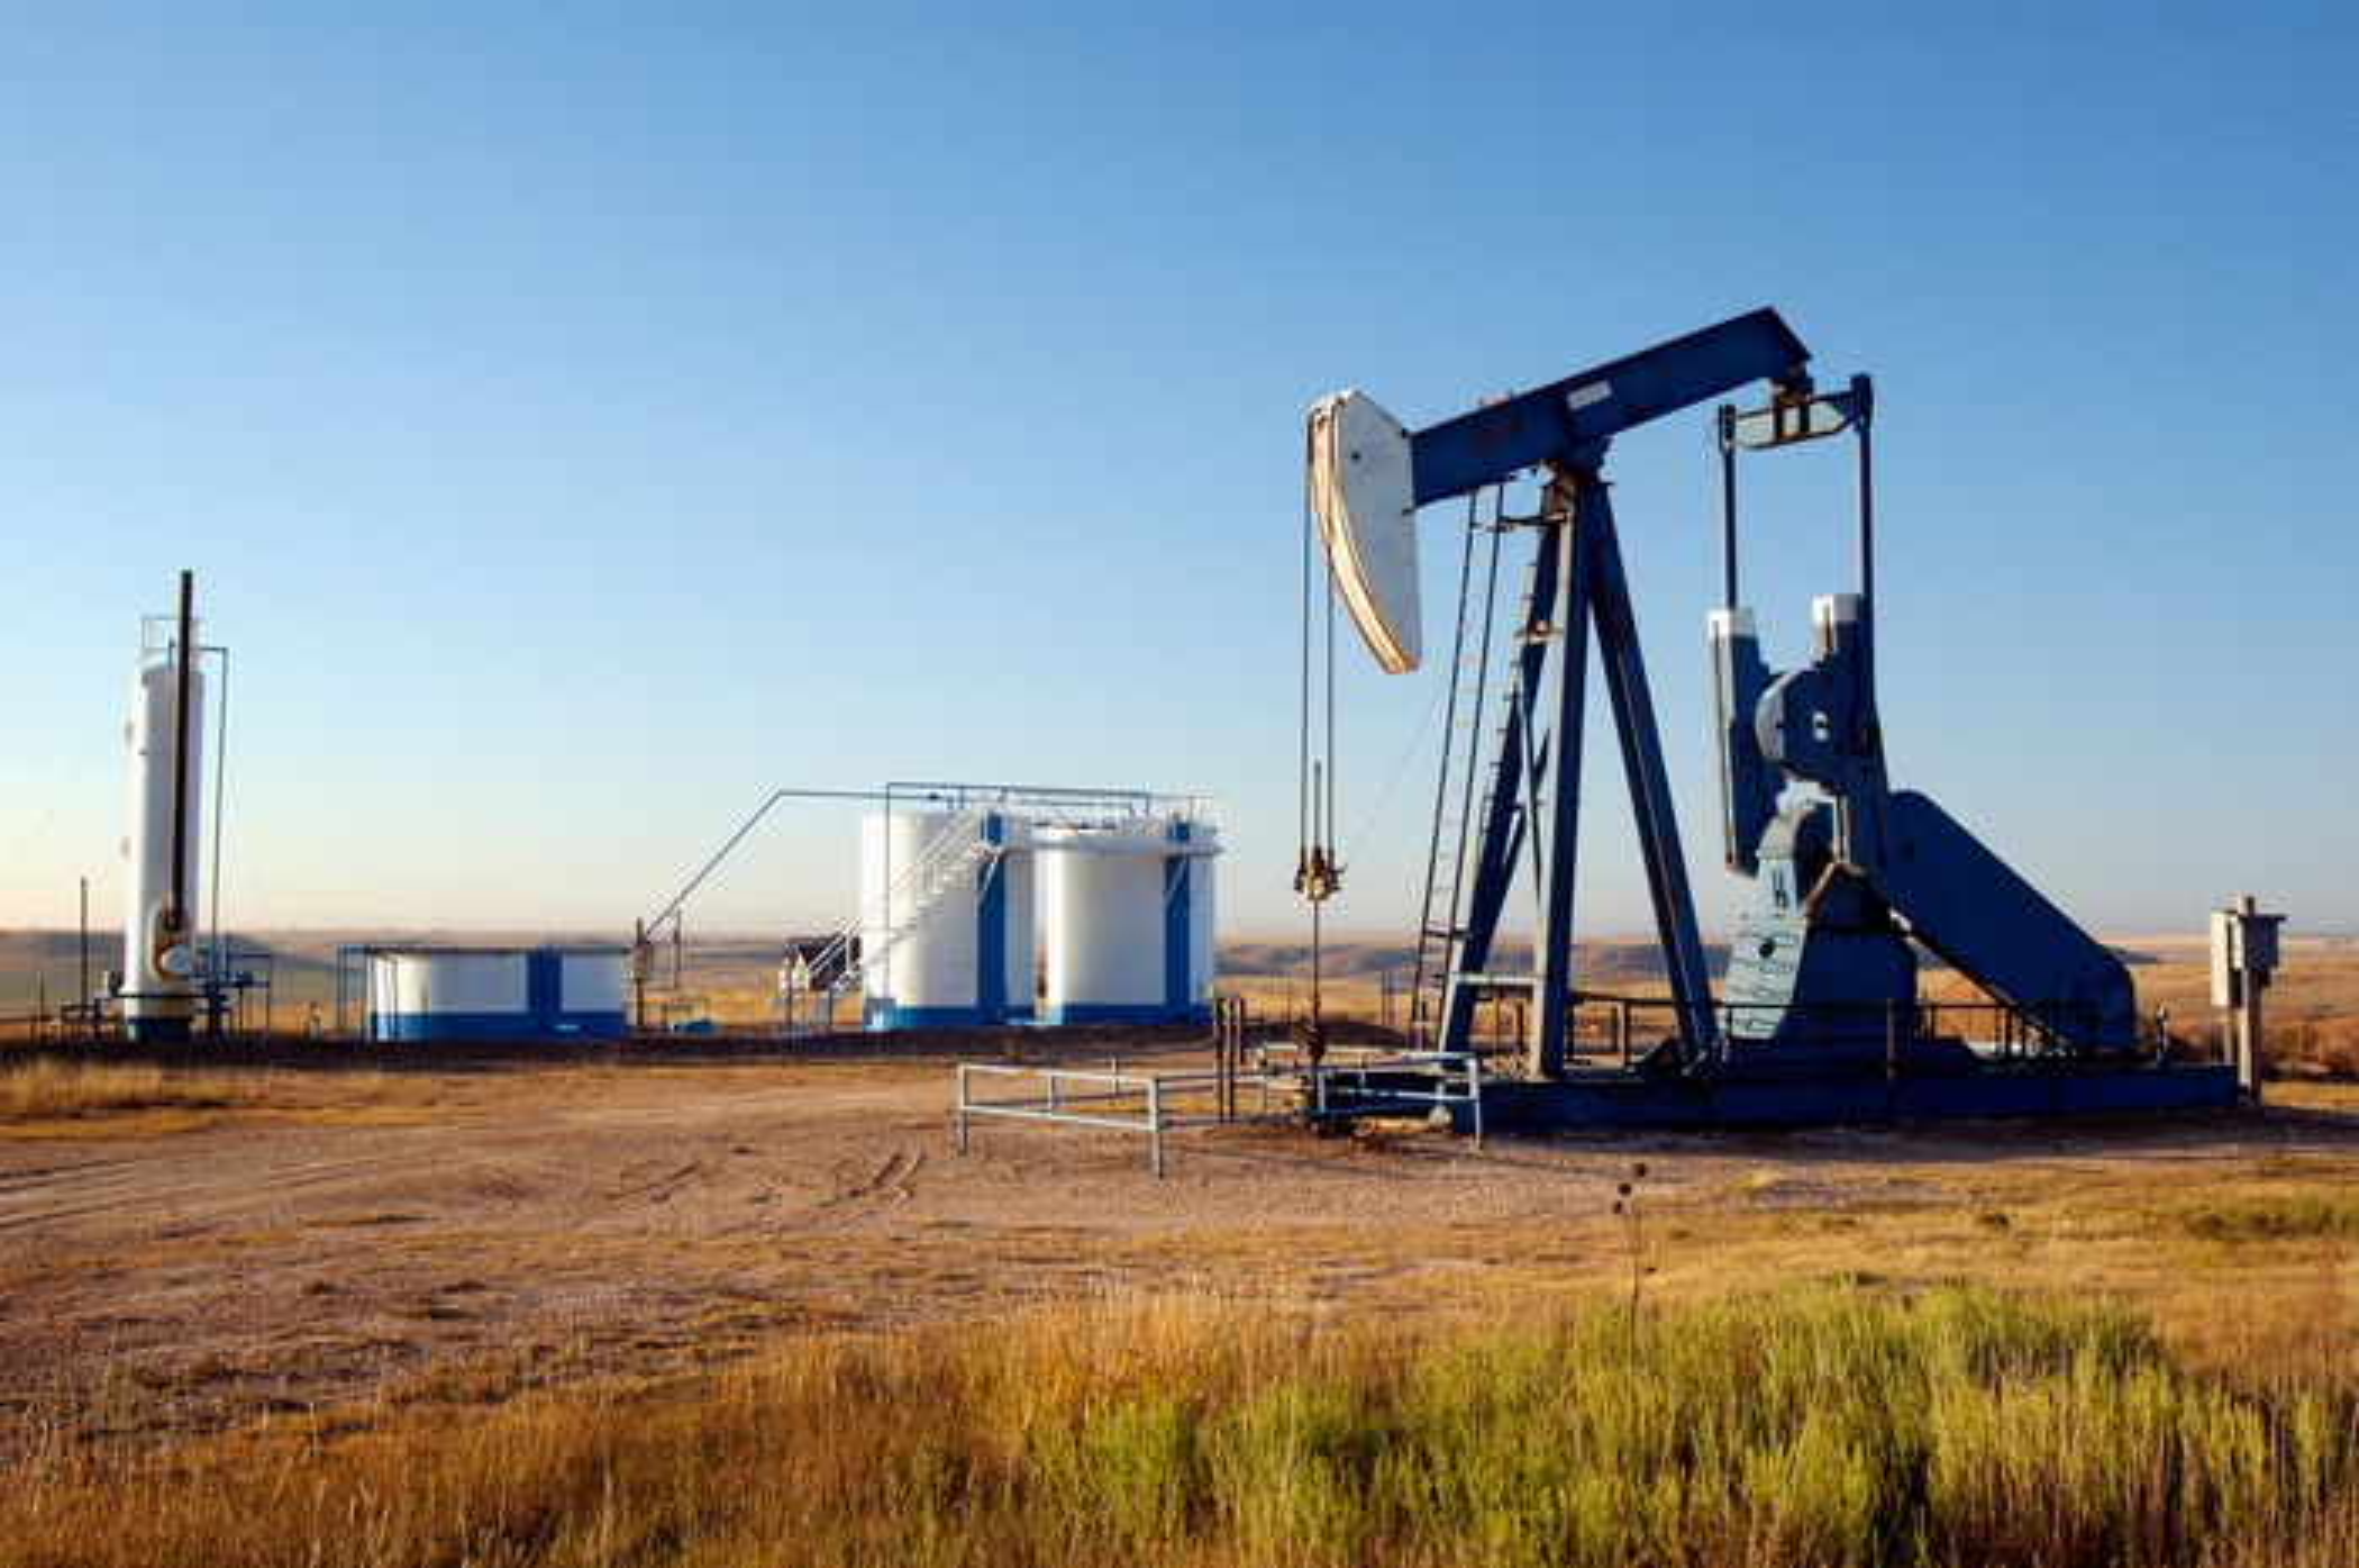 An oil pump next to some storage tanks